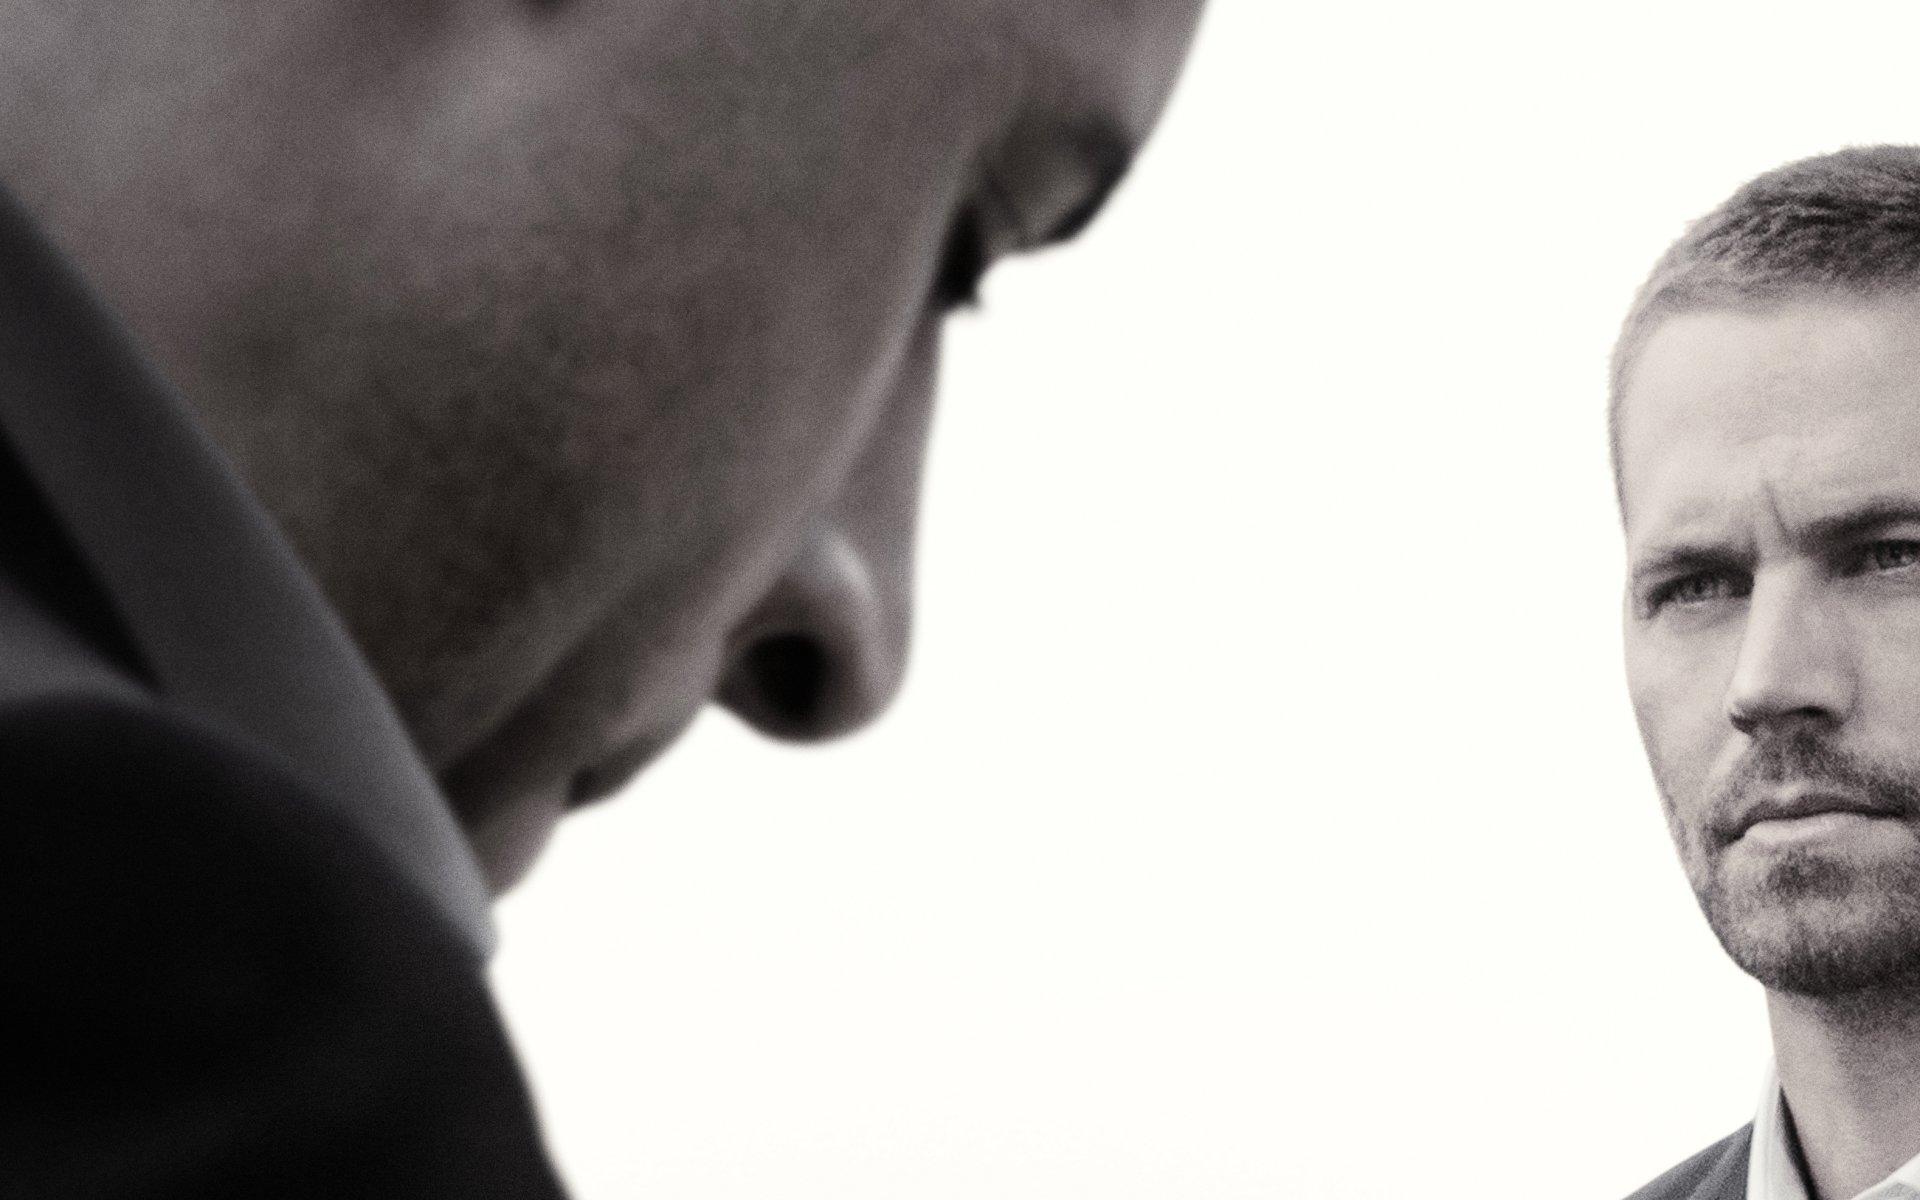 Movie - Furious 7  Dominic Toretto Vin Diesel Brian O'Conner Paul Walker Fast & Furious Wallpaper